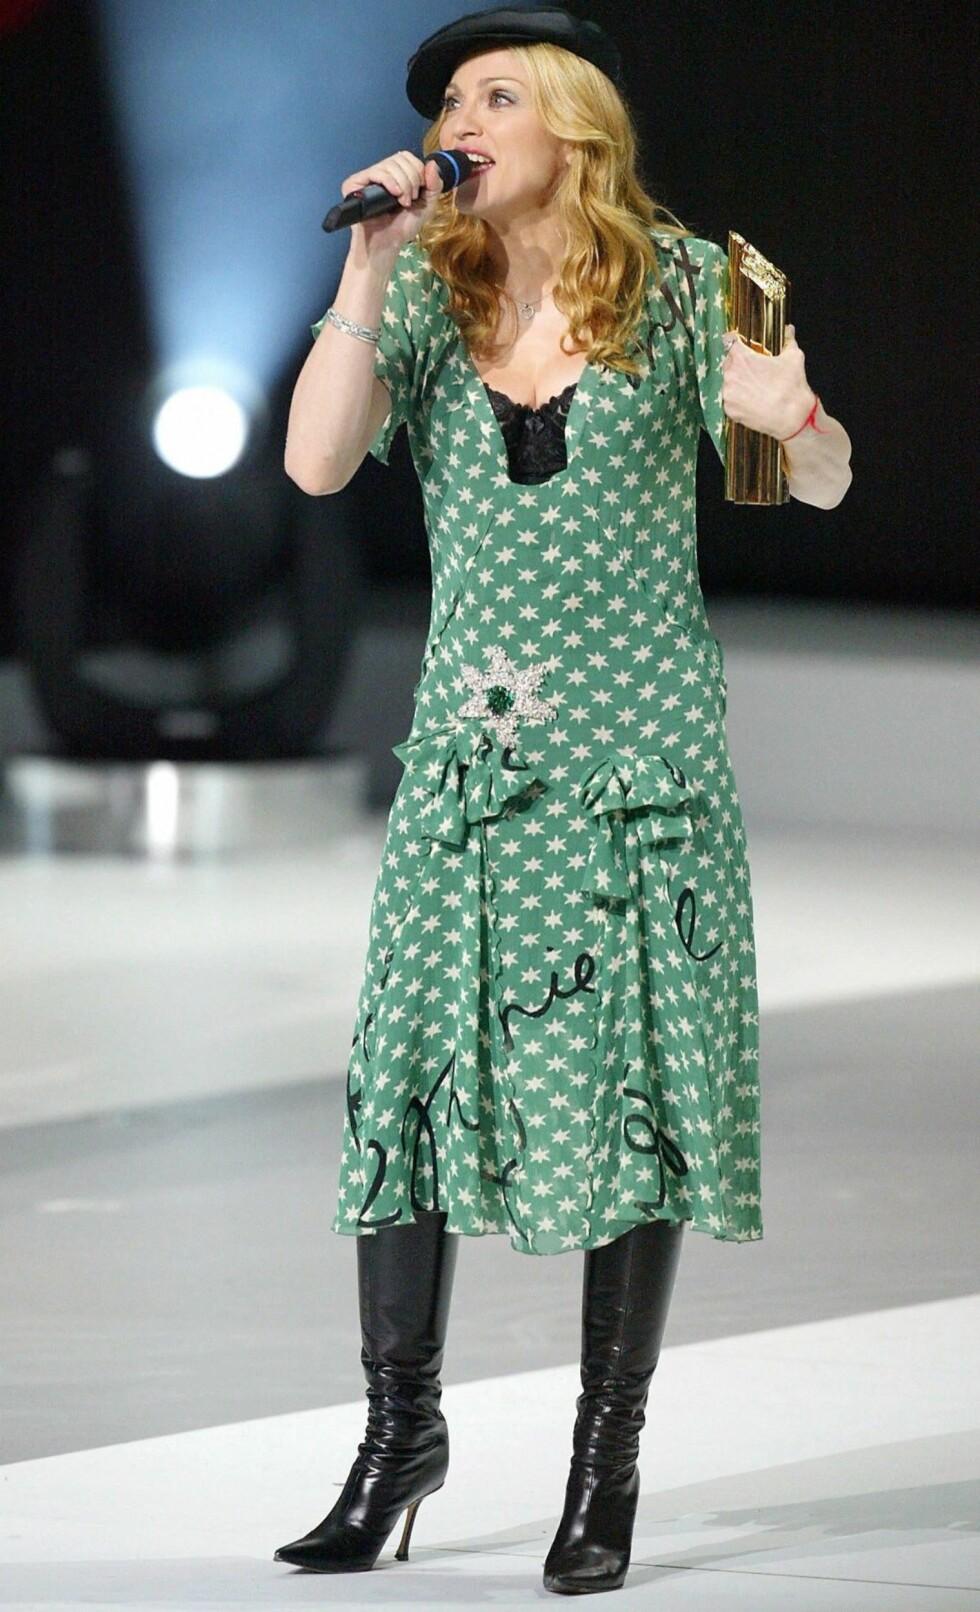 Madonna i dydig pariser-stil under NRJ Music Awards i Frankrike.